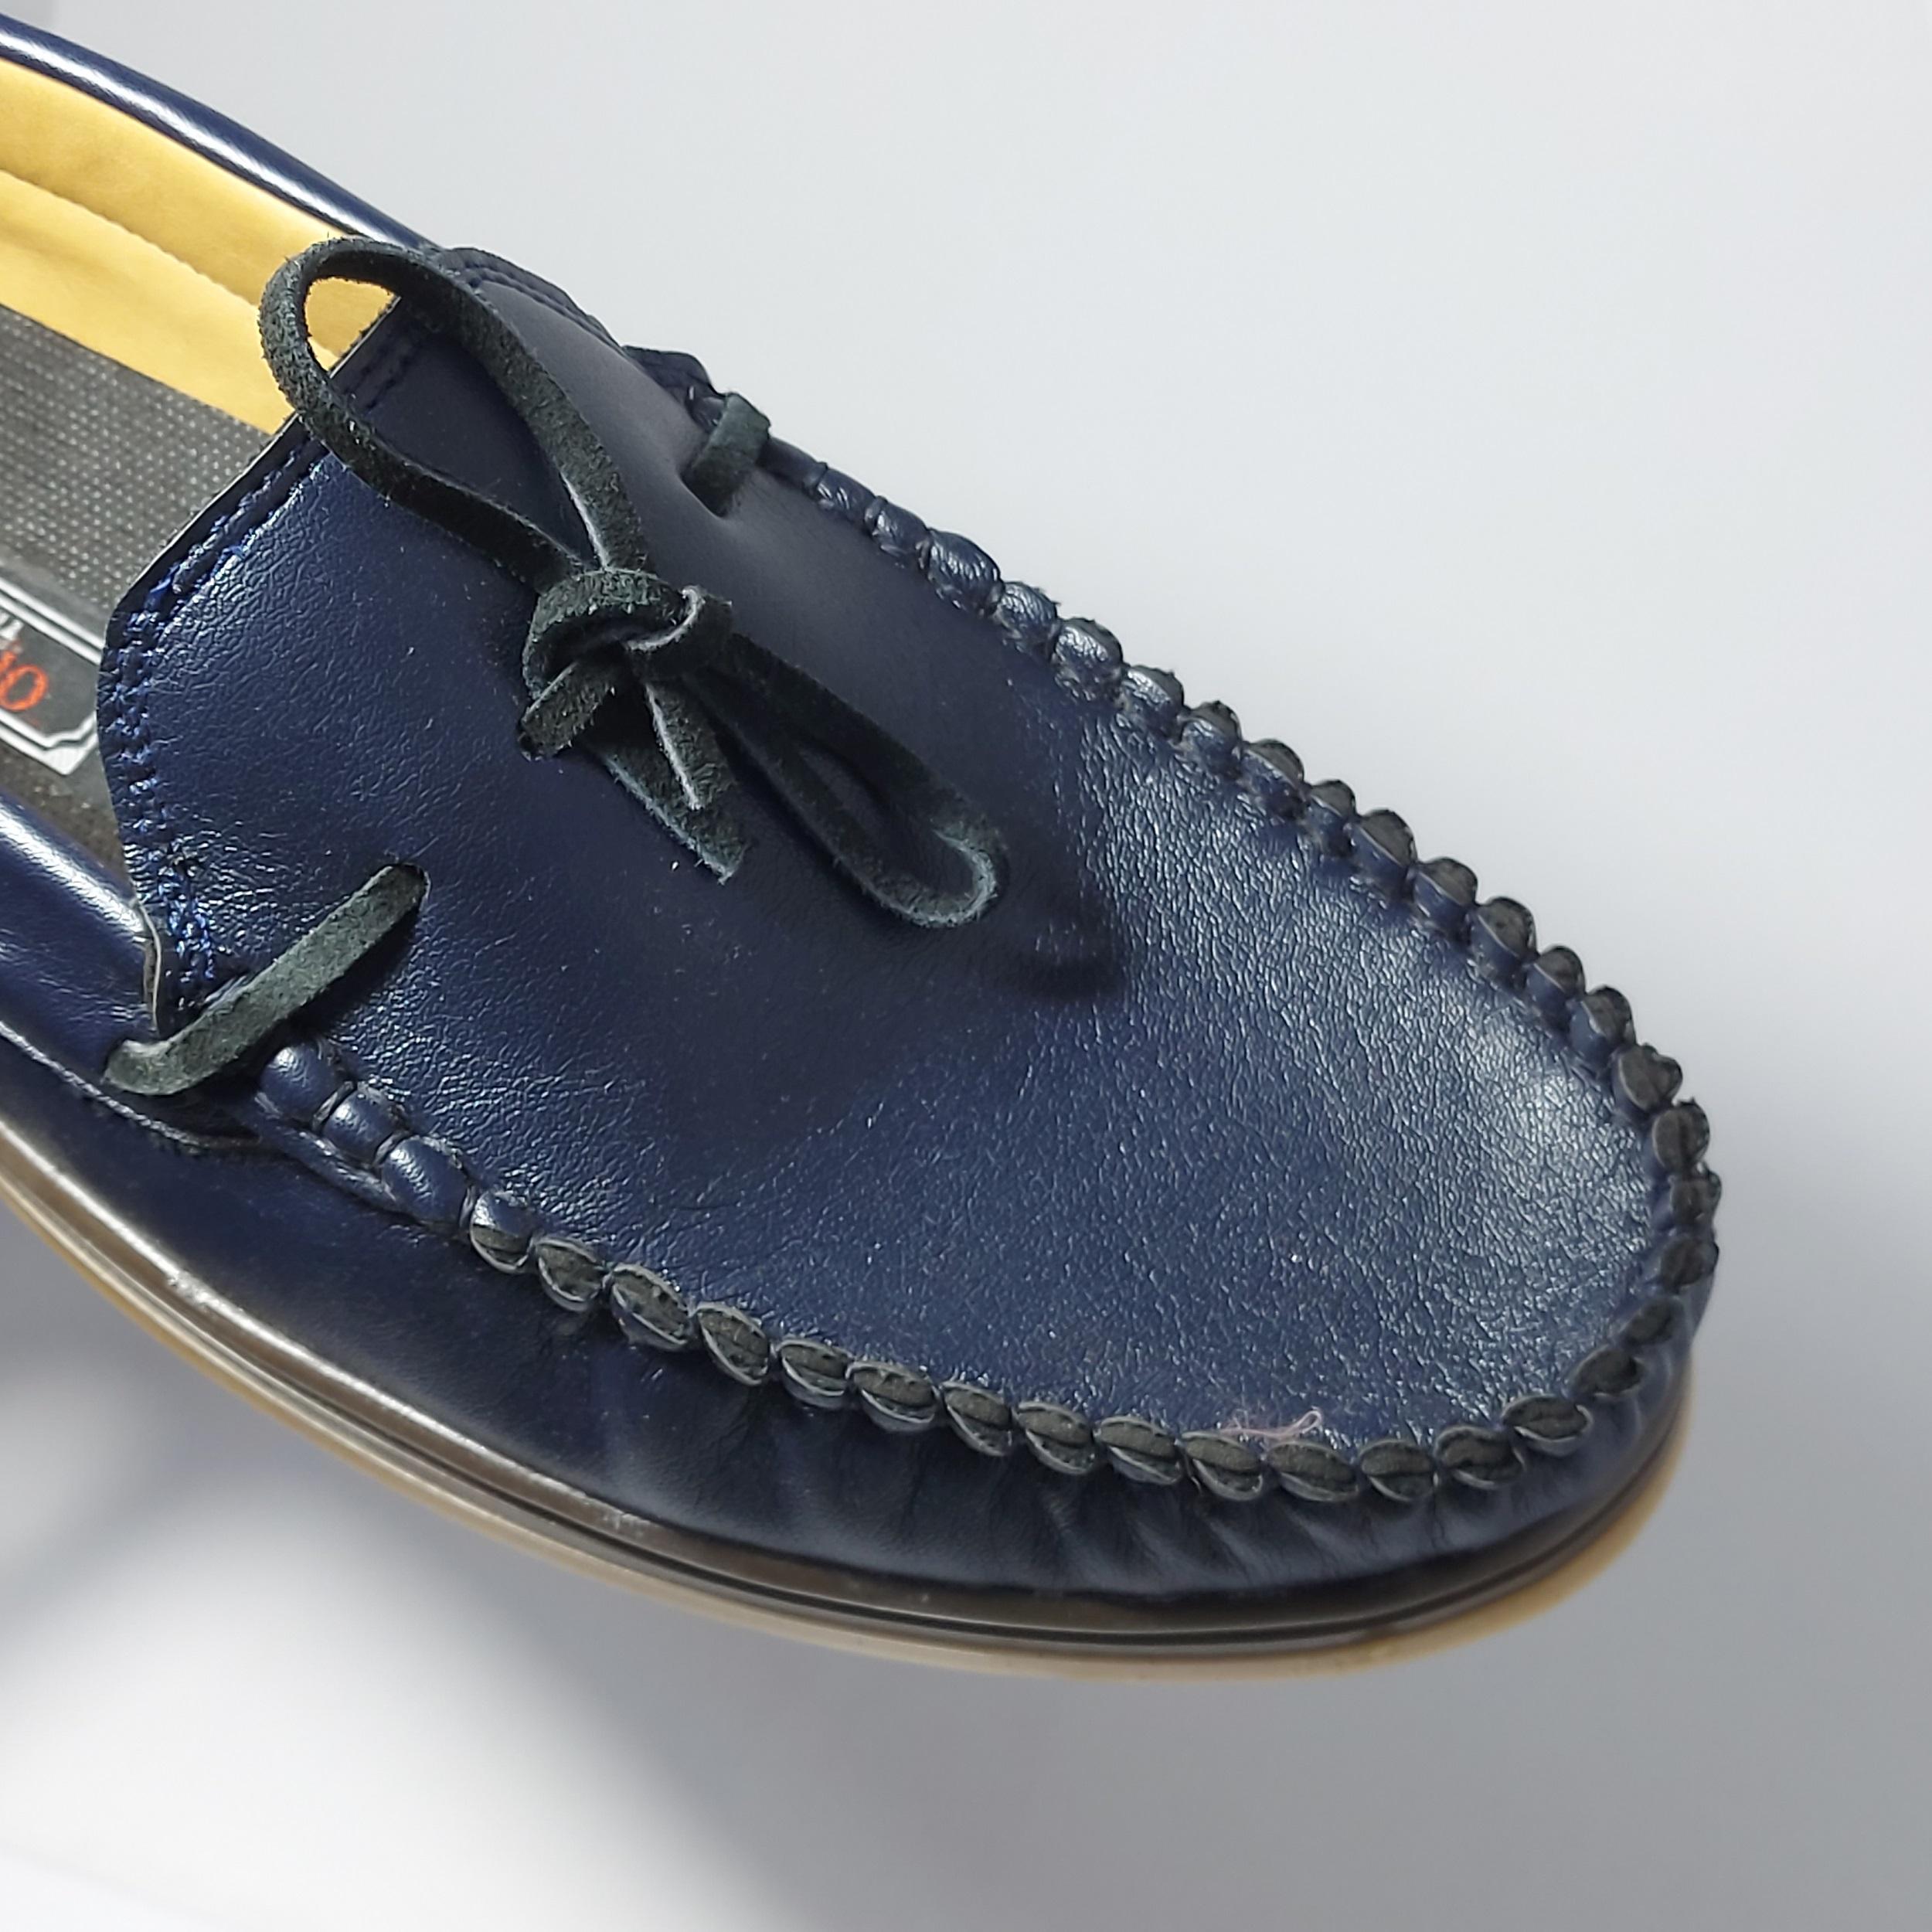 کفش روزمره مردانه مدل CH001 -  - 6